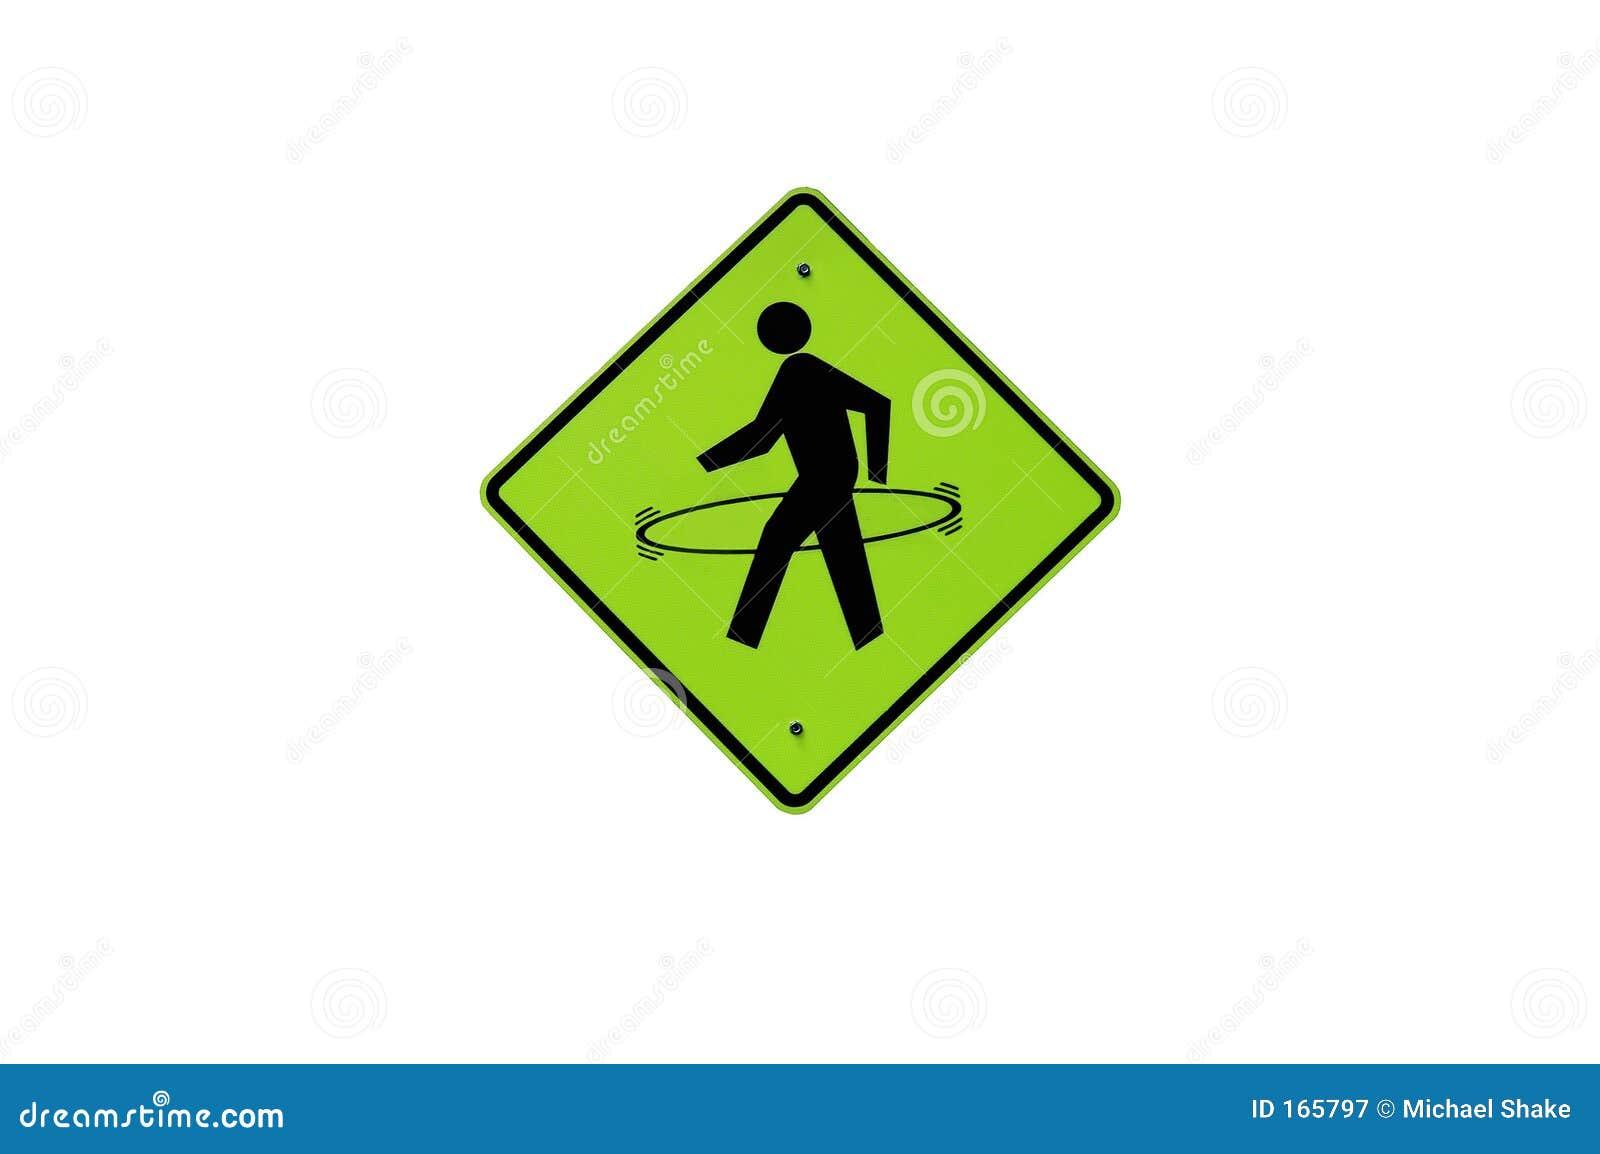 Waking Man Sign with Hula Hoop